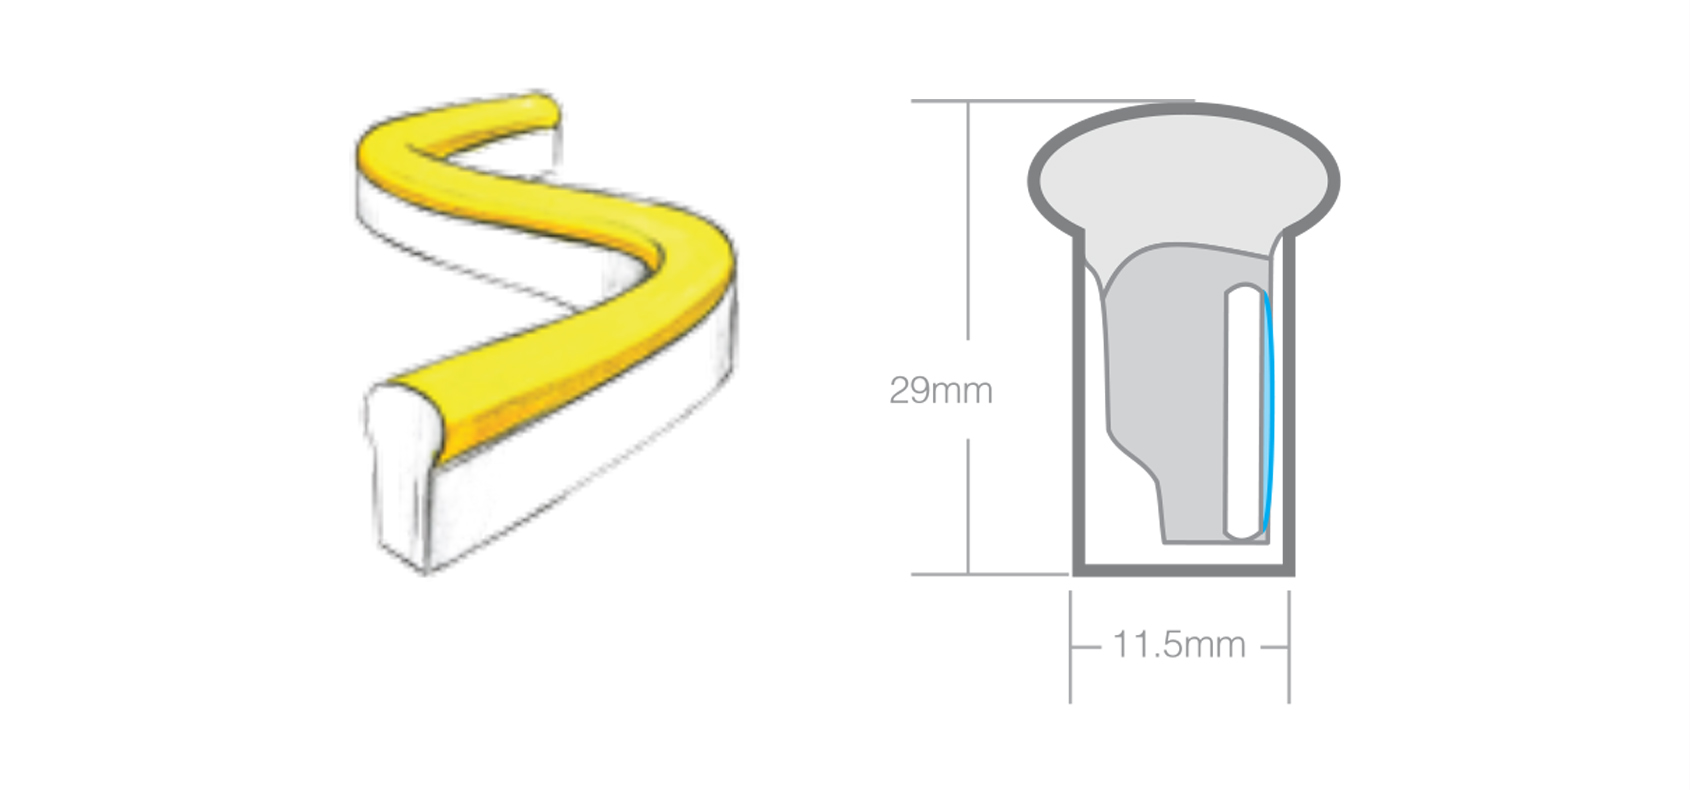 270⁰-Bendable-Dimension